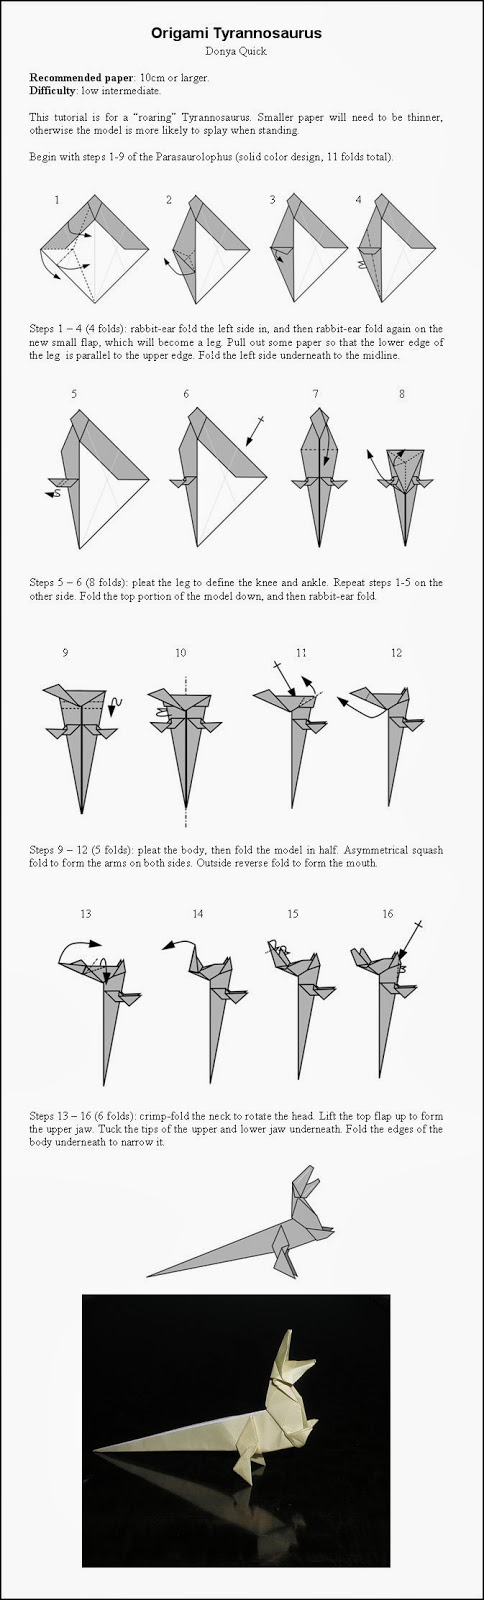 Origami trex instructions dinosaur tattoo inspiration pinterest origami trex instructions thecheapjerseys Gallery